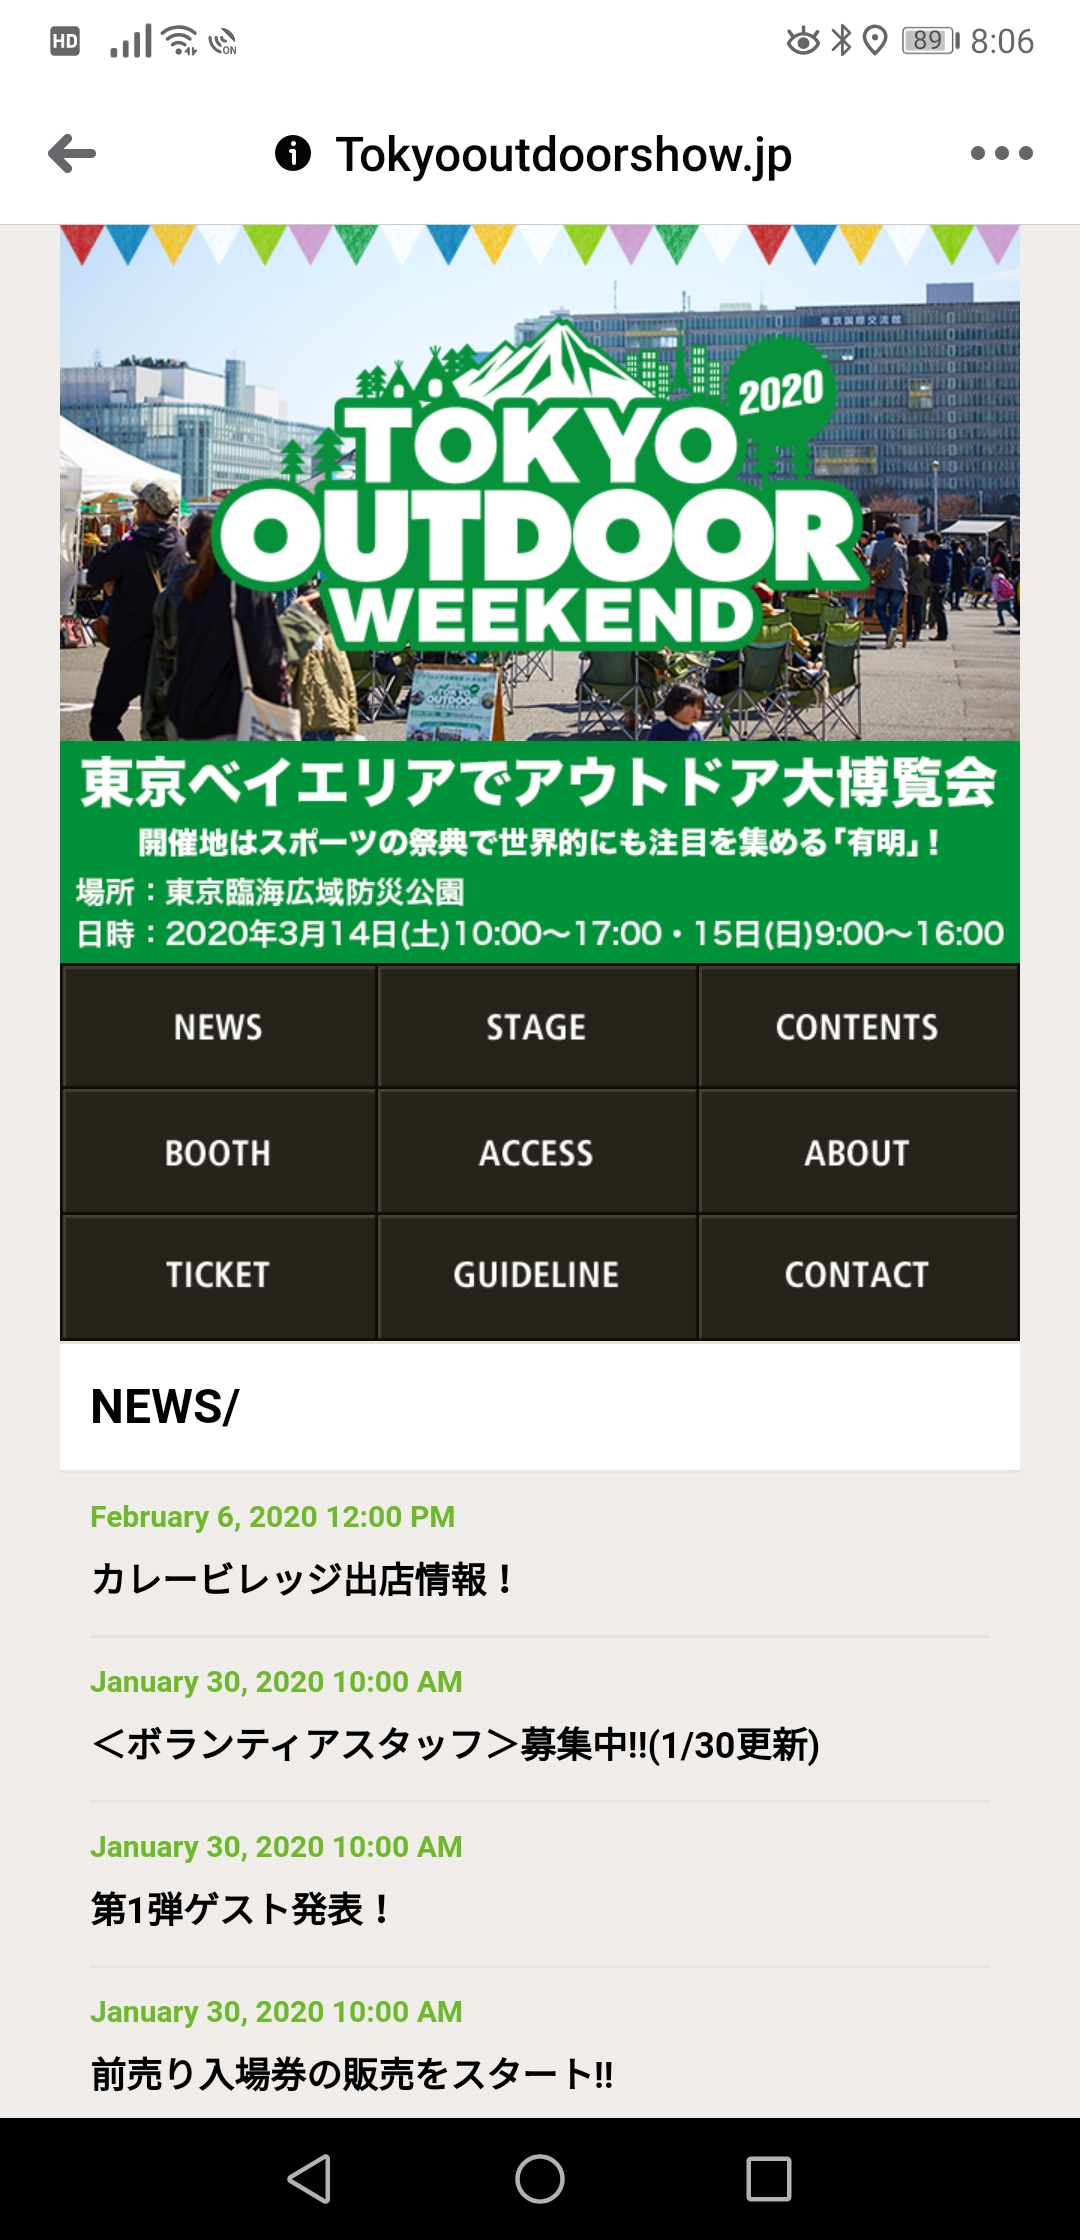 TOKYO OUTDOOR WEEKENDに出展します